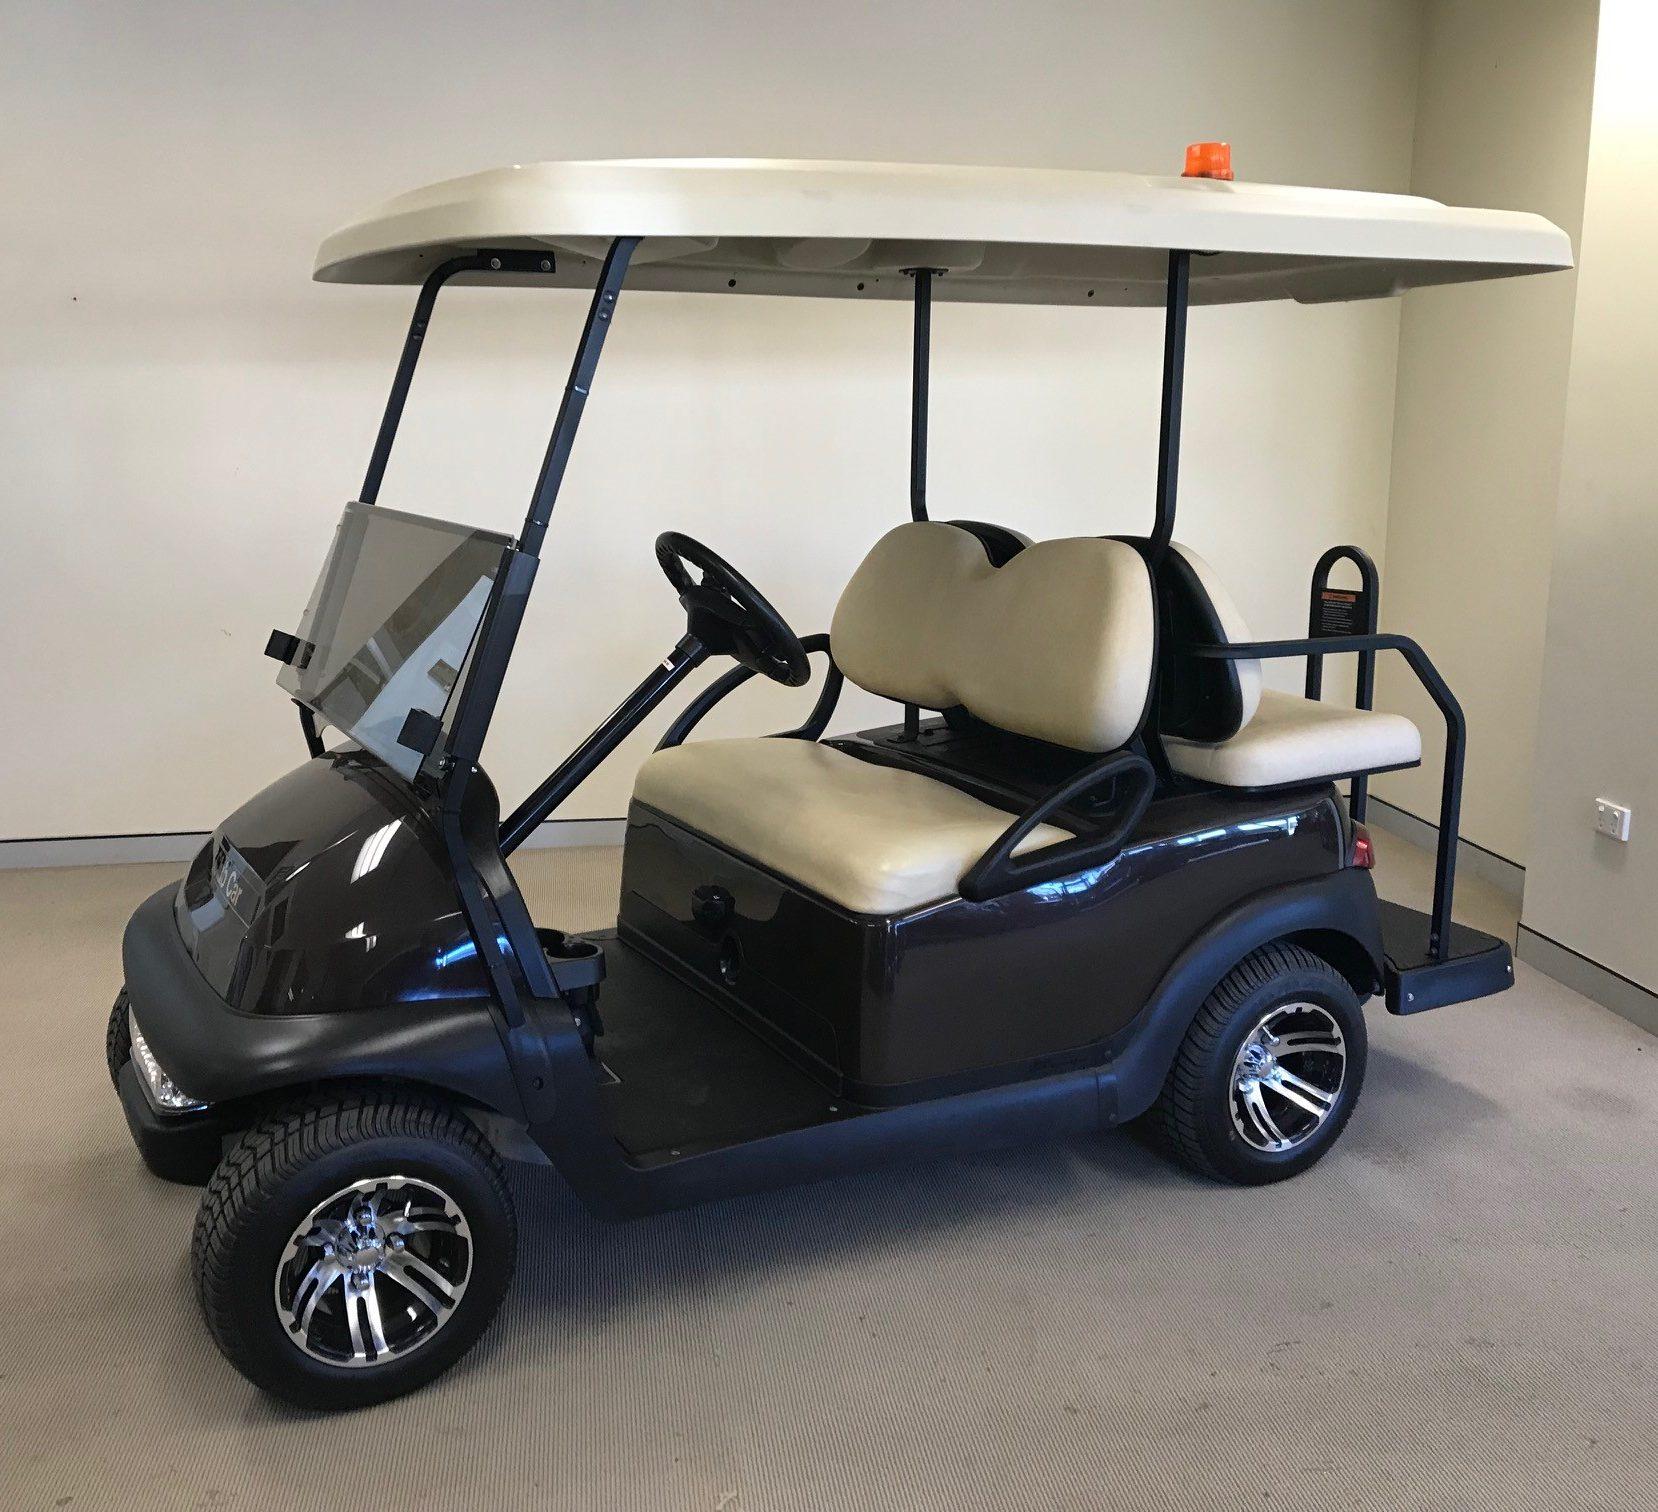 Club Car Villager 4 2016 48V Electric - Highland Golf Carts